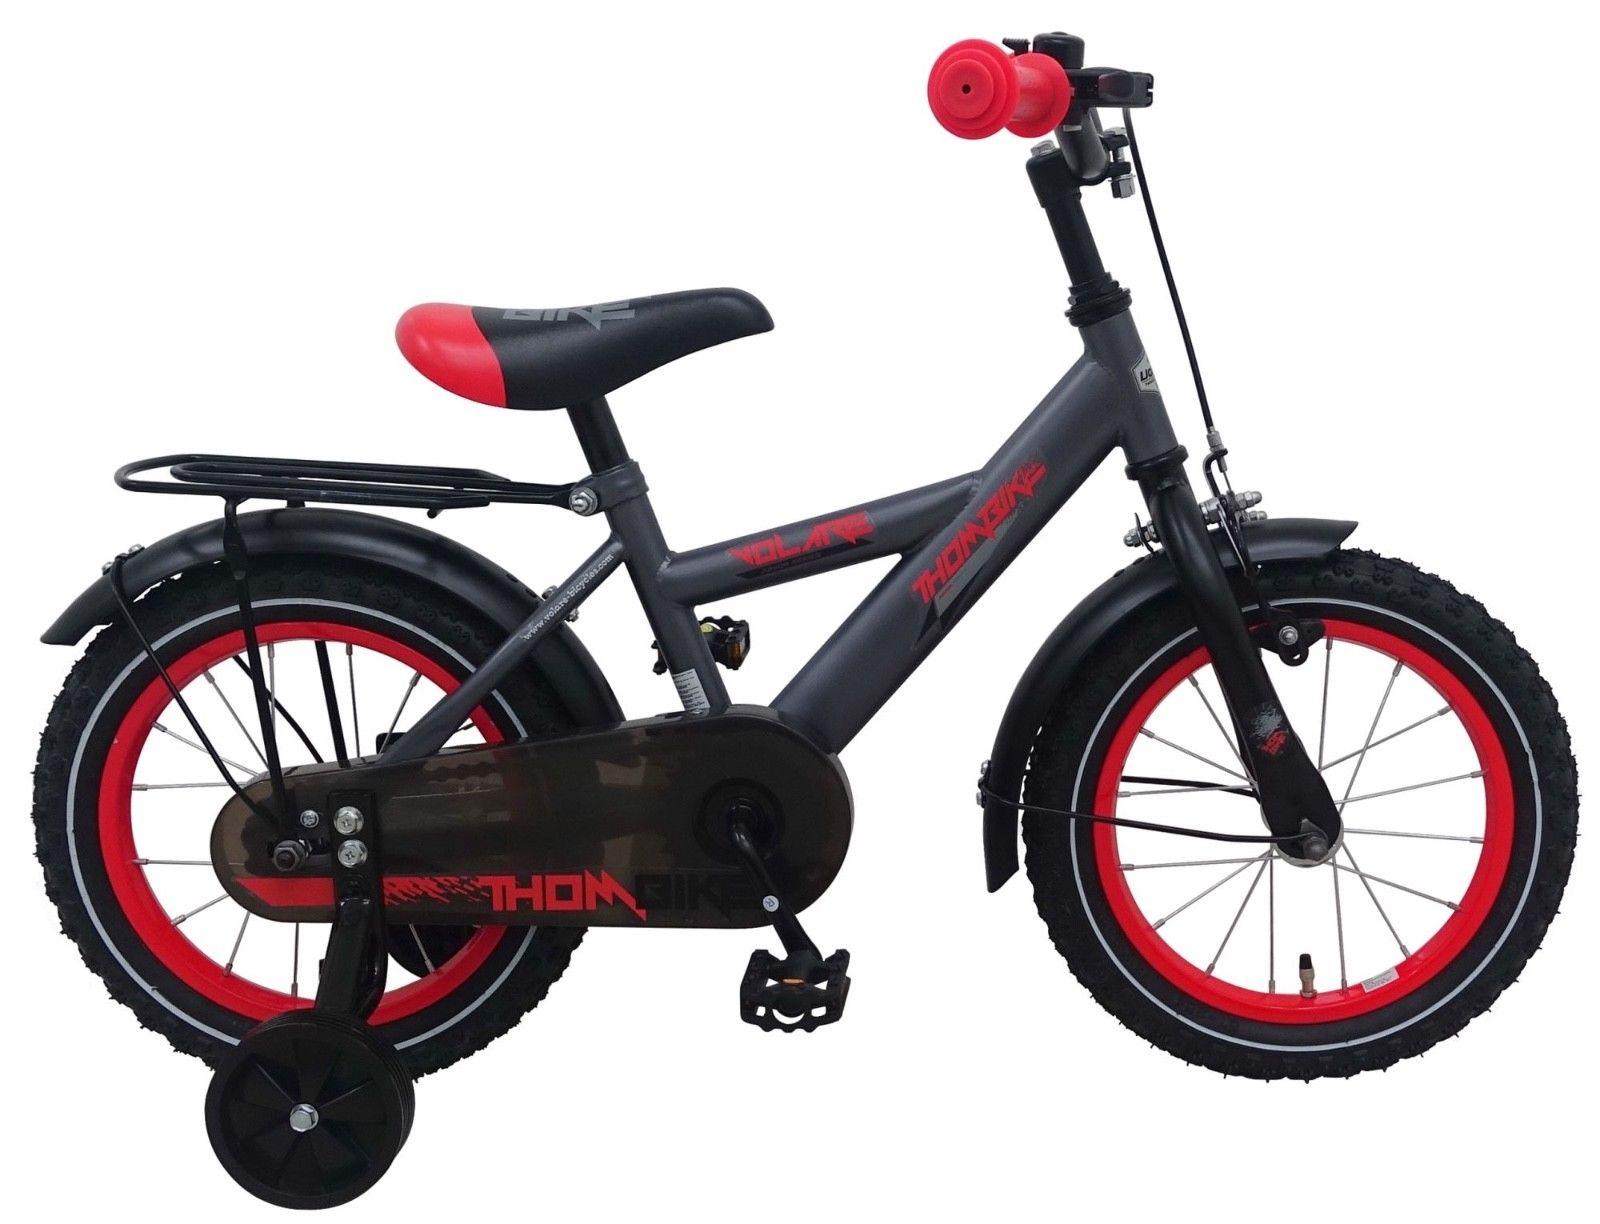 fahrrad 14 zoll jungen kinderfahrrad jungenfahrrad r cktrittbremse grau 81418 ebay. Black Bedroom Furniture Sets. Home Design Ideas